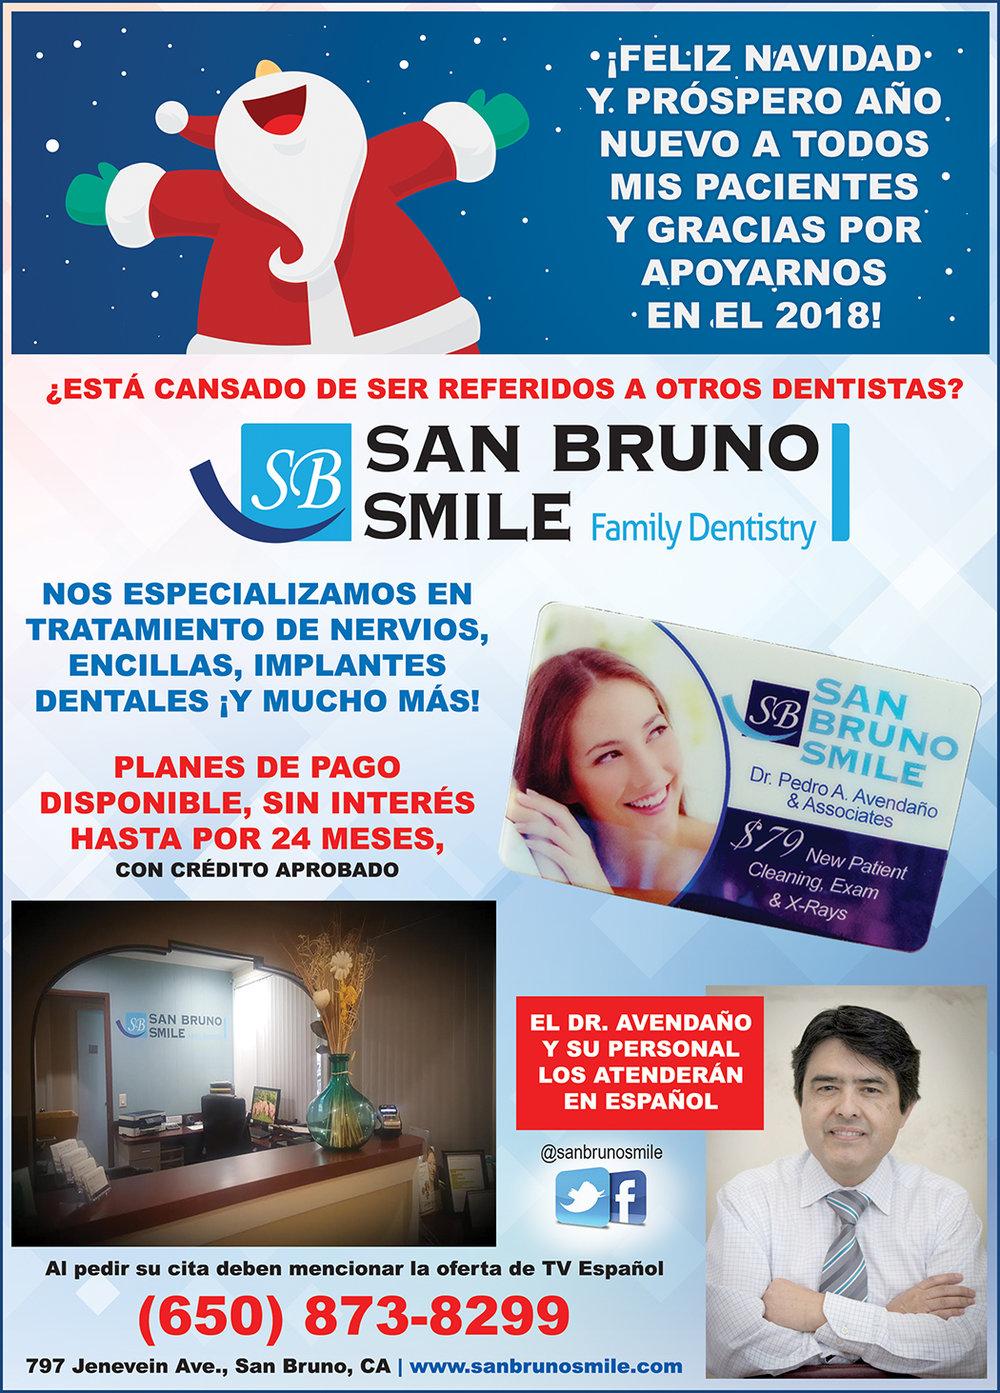 San Bruno Smile 1-2  pag GLOSSY diciembre 2018.jpg